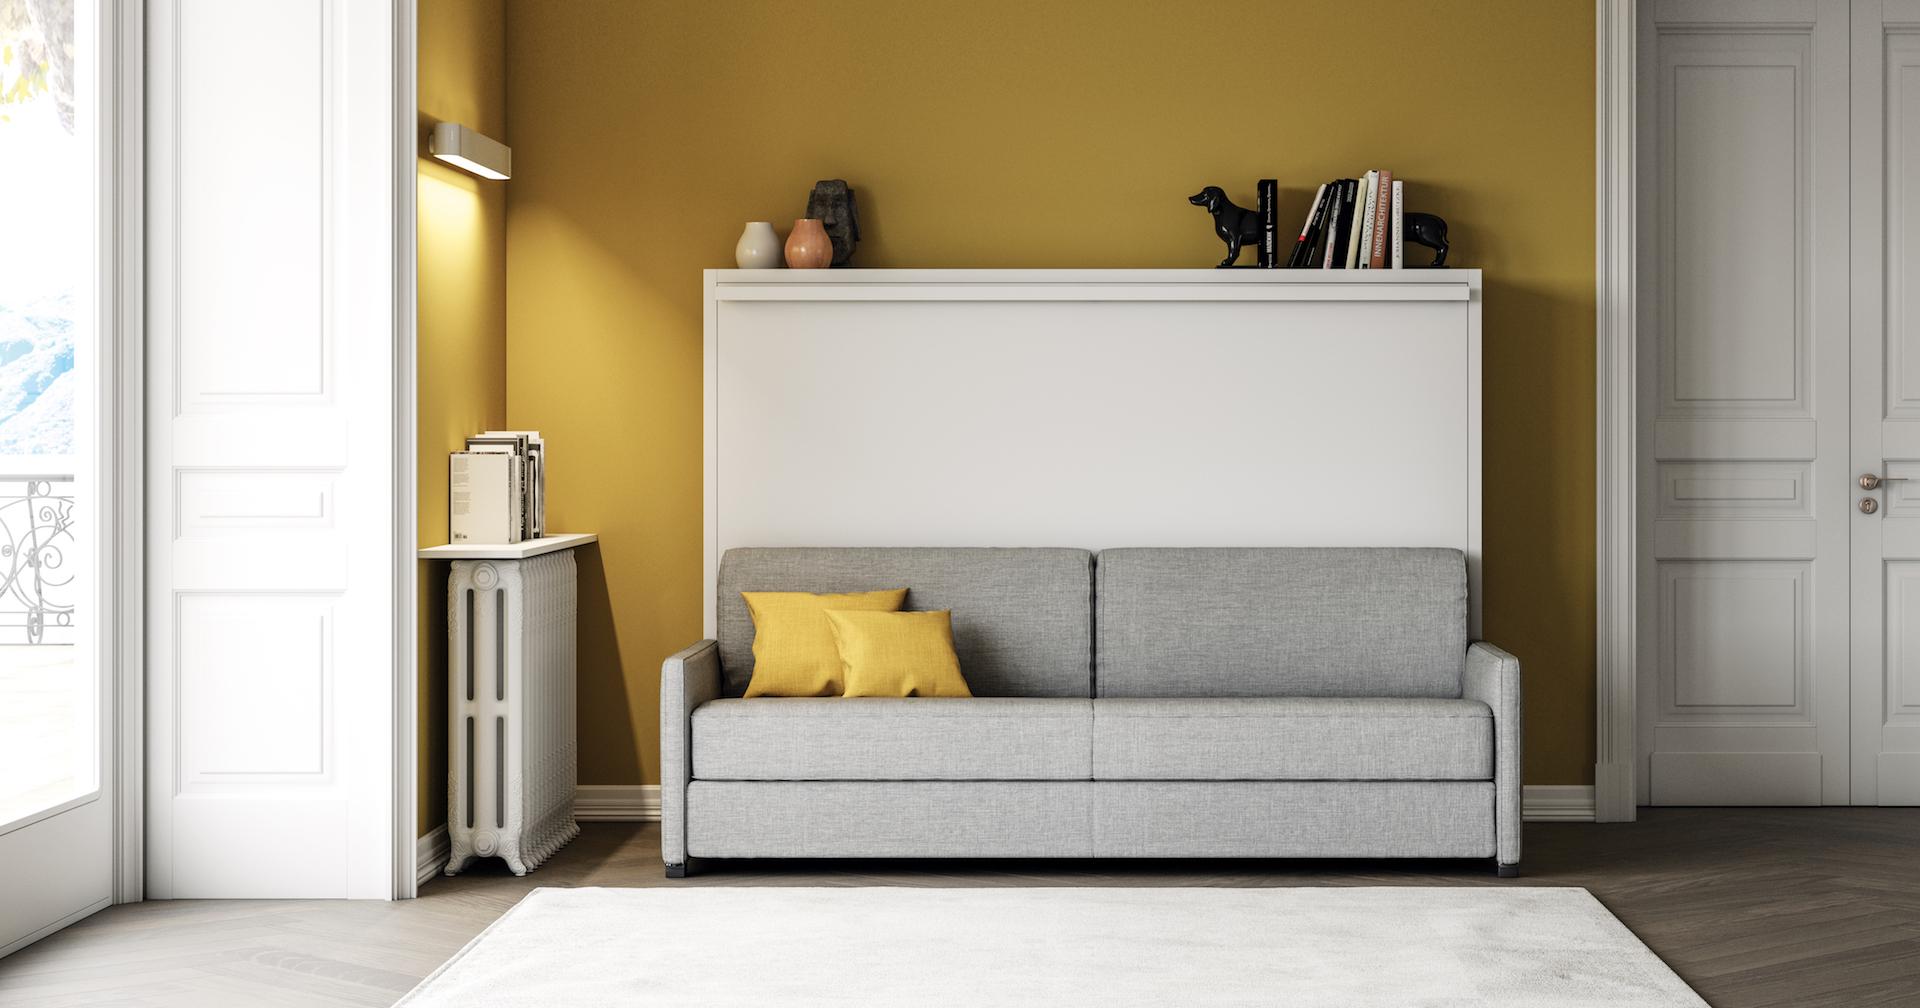 Lit mural avec divan - sofag